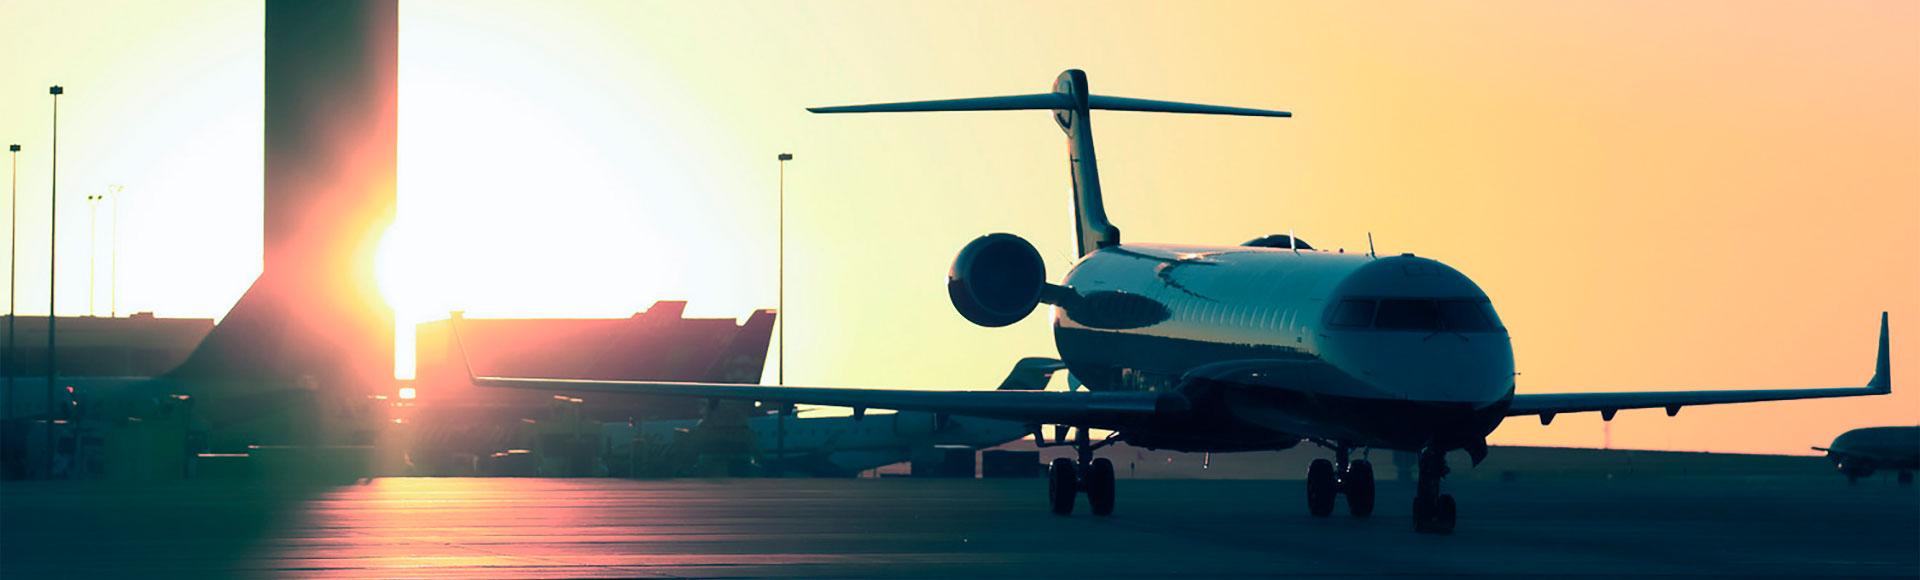 Flights, Airlines | Denver International Airport